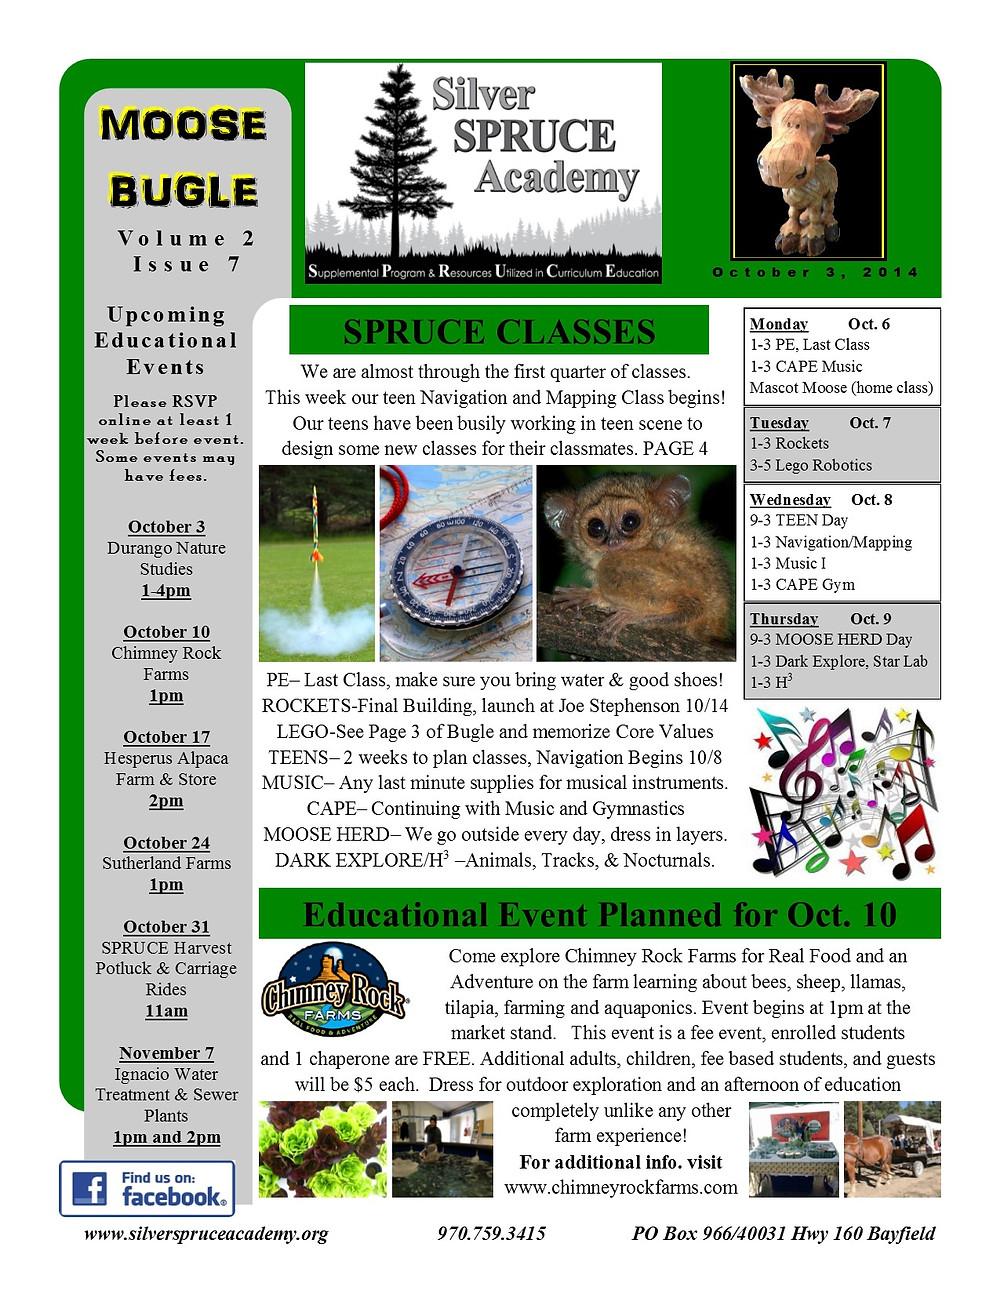 Moose Bugle 10-3-14 Page 1.jpg